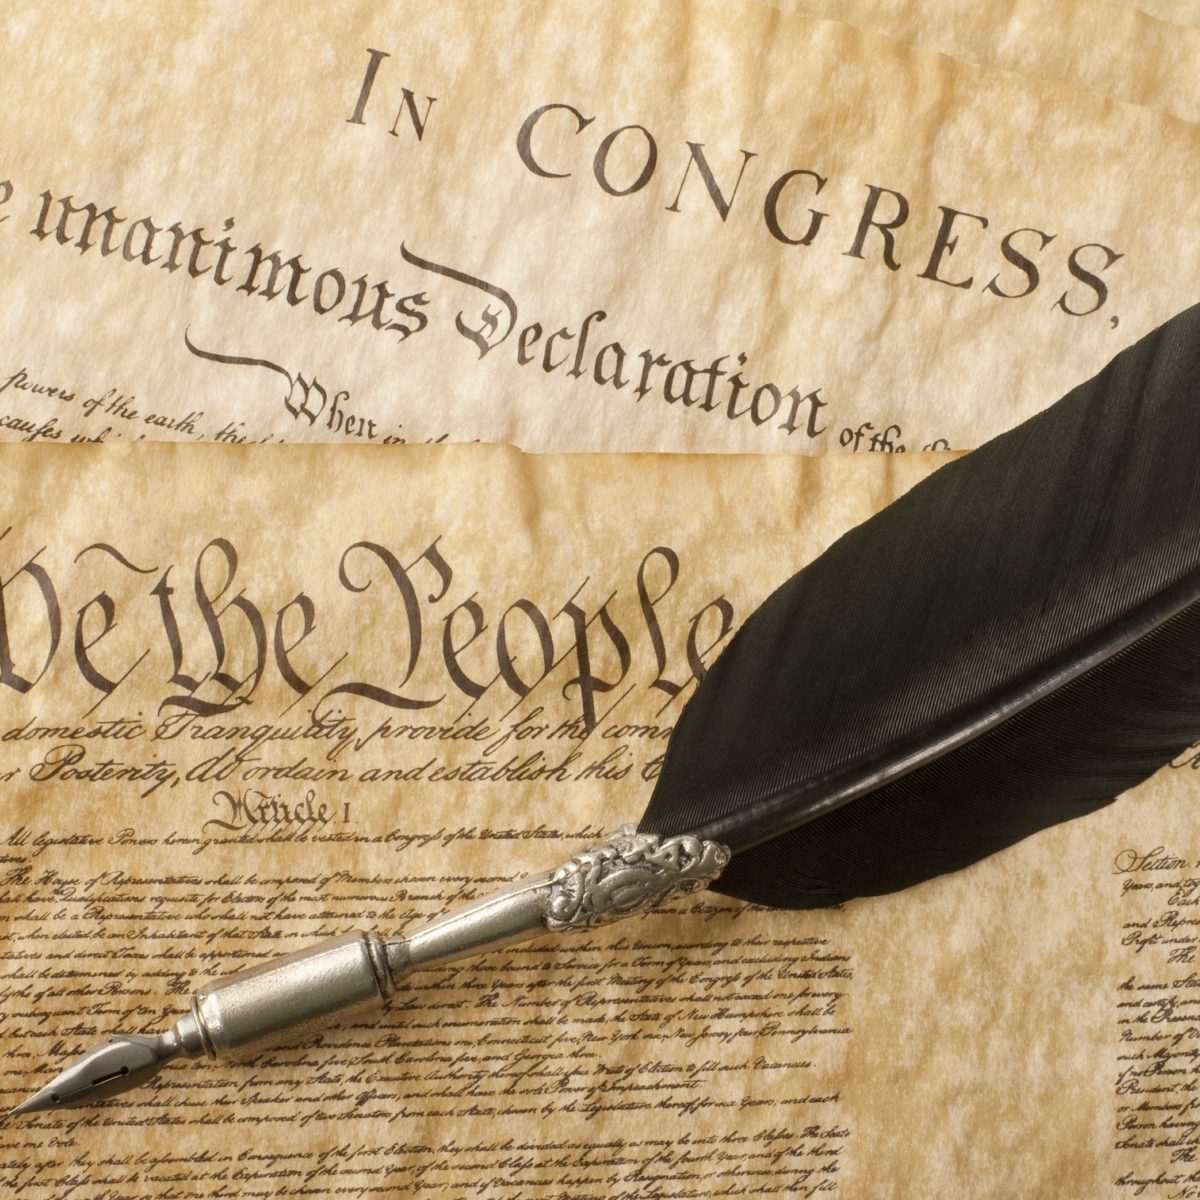 13 Glaring Grammar Mistakes in the U.S. Constitution